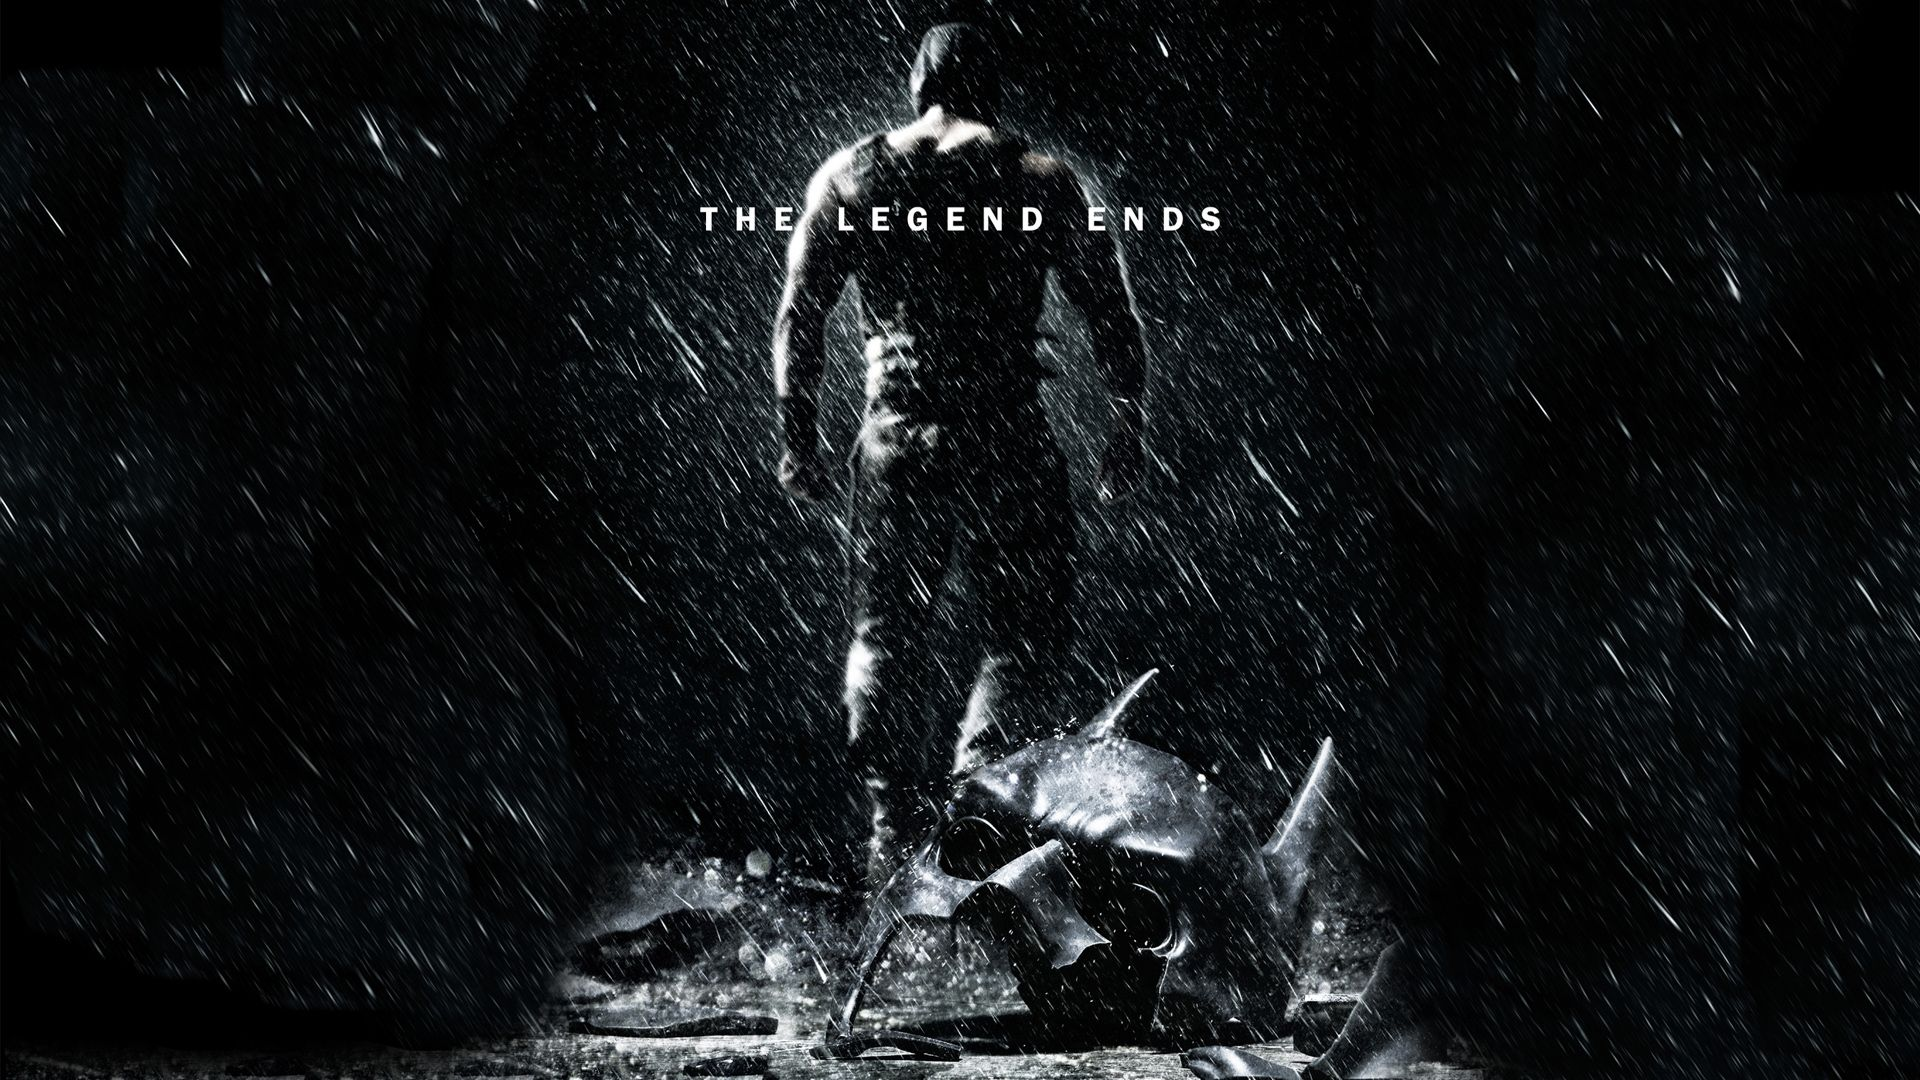 The Dark Knight Rises 2012 Wallpaper Hd 1080p Hd Desktop Wallpapers